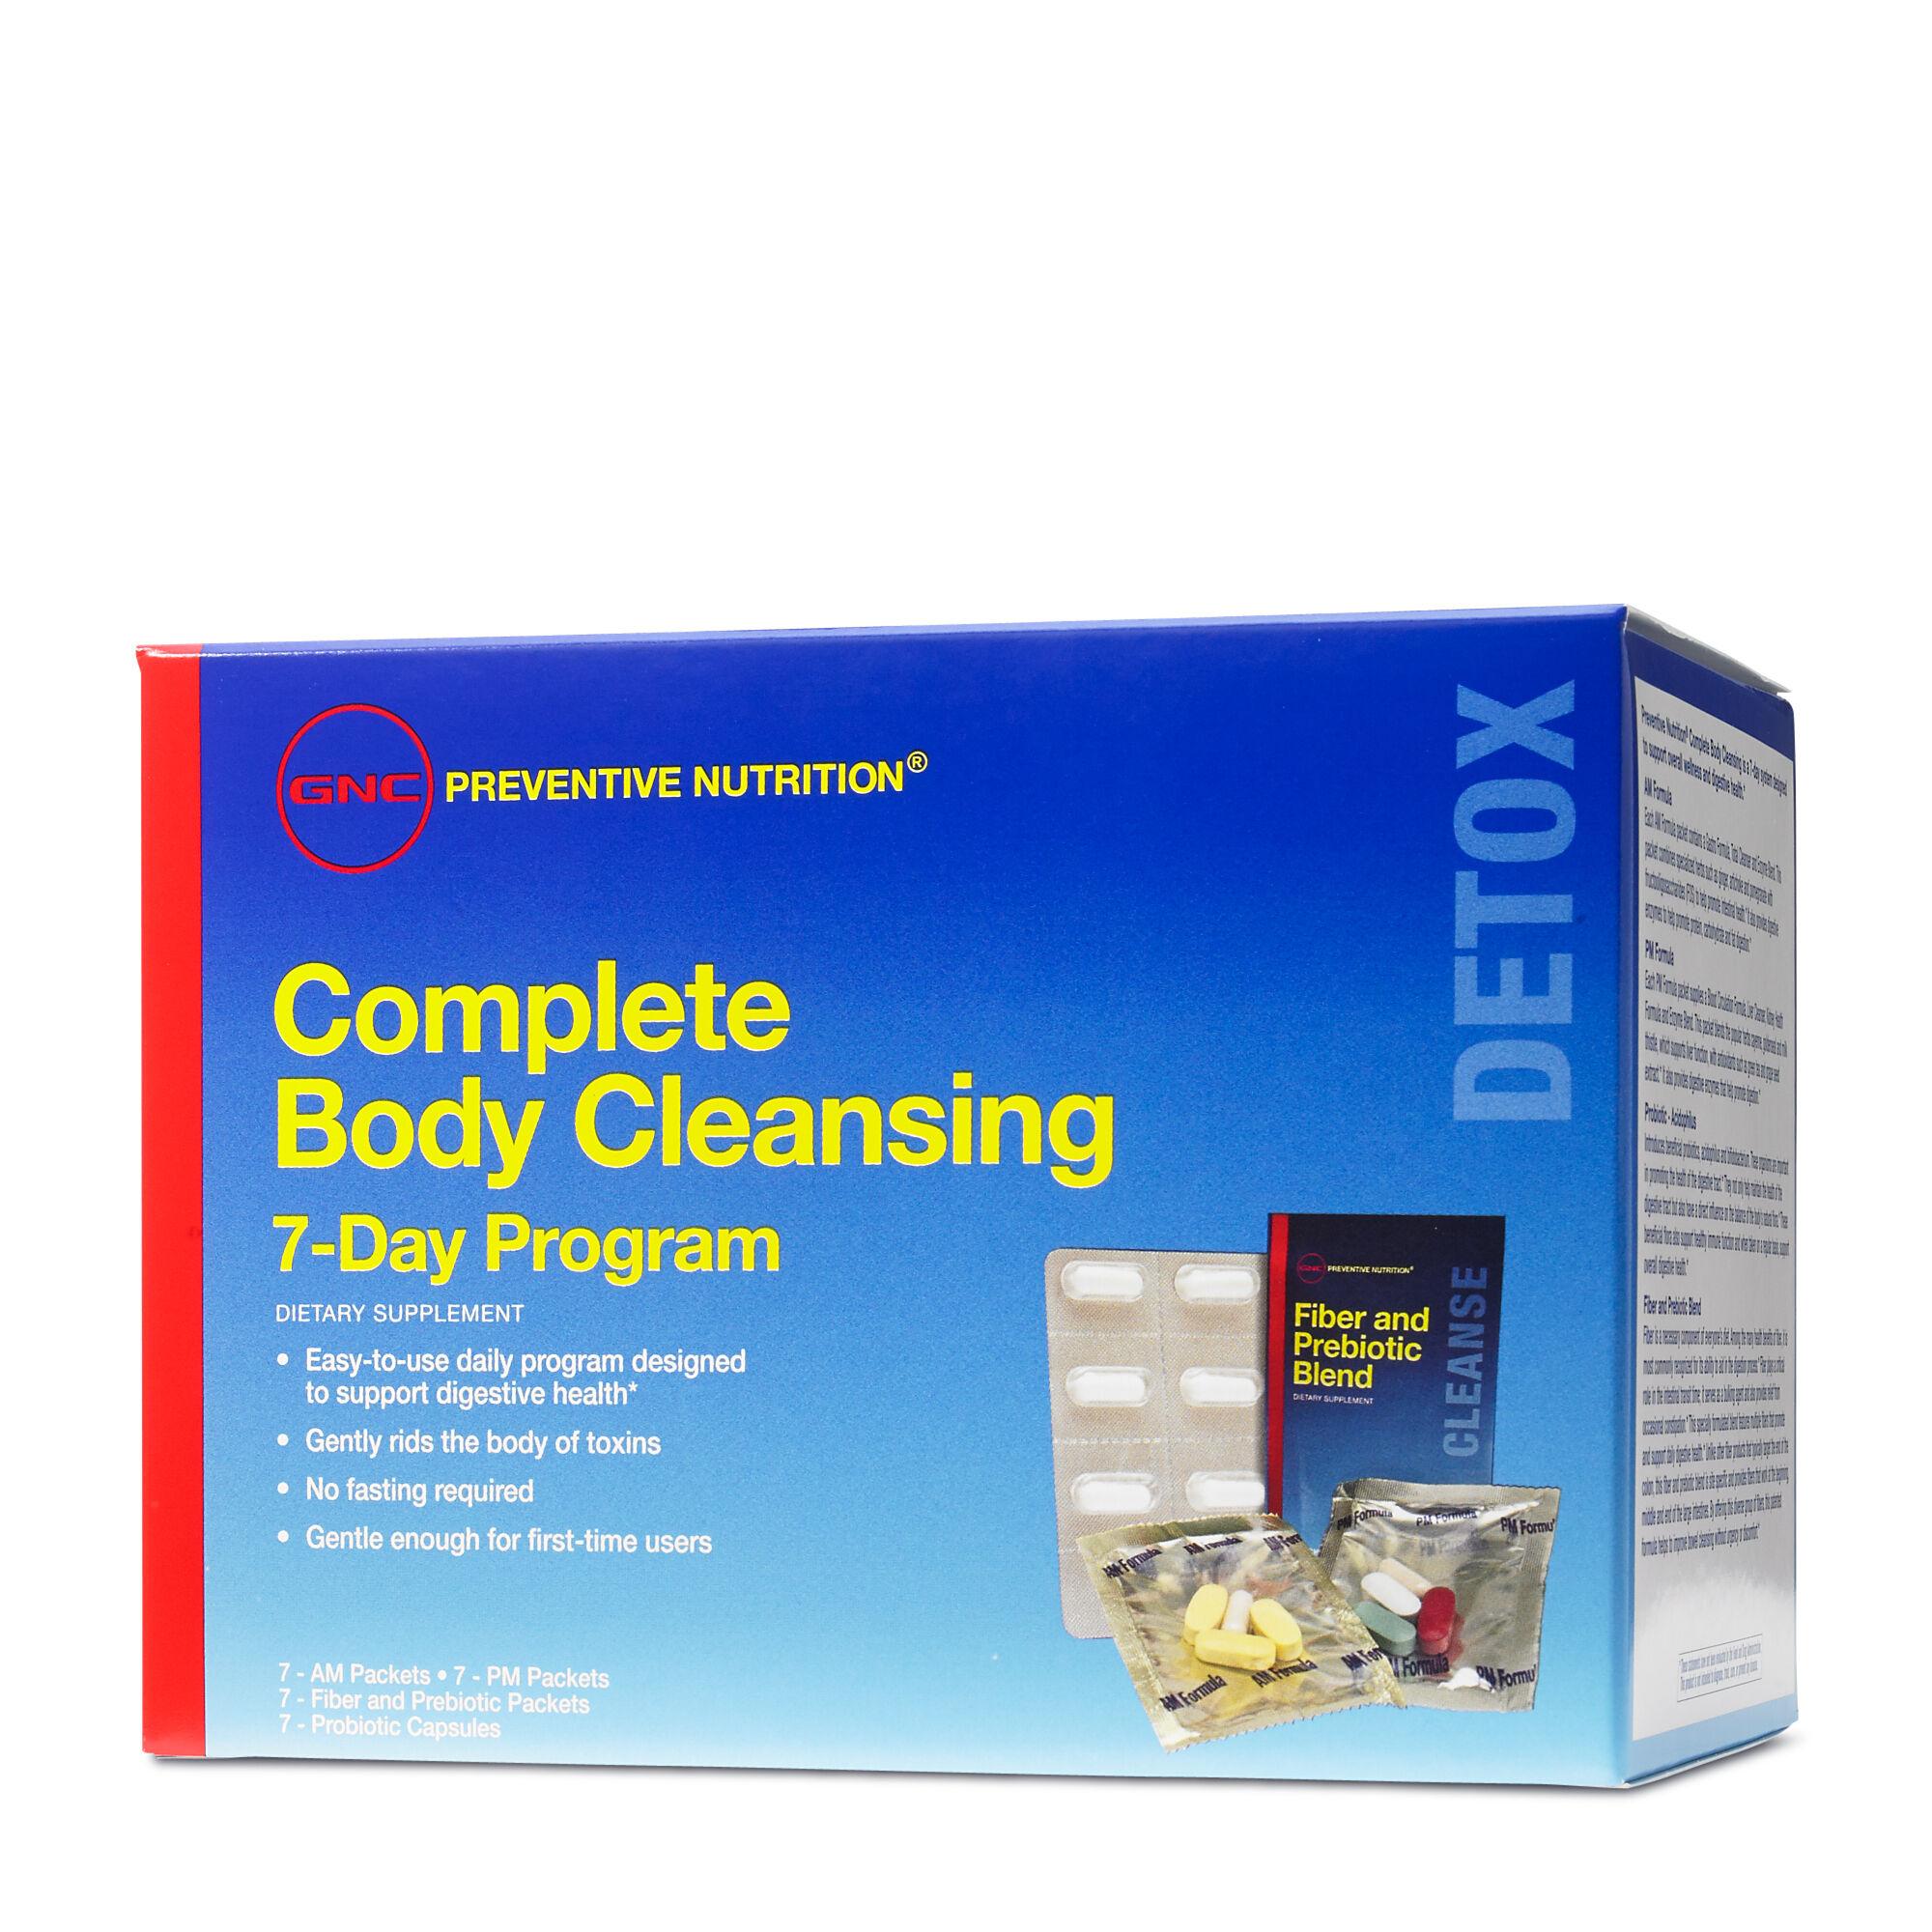 GNC Preventive Nutrition® Complete Body Cleansing Program